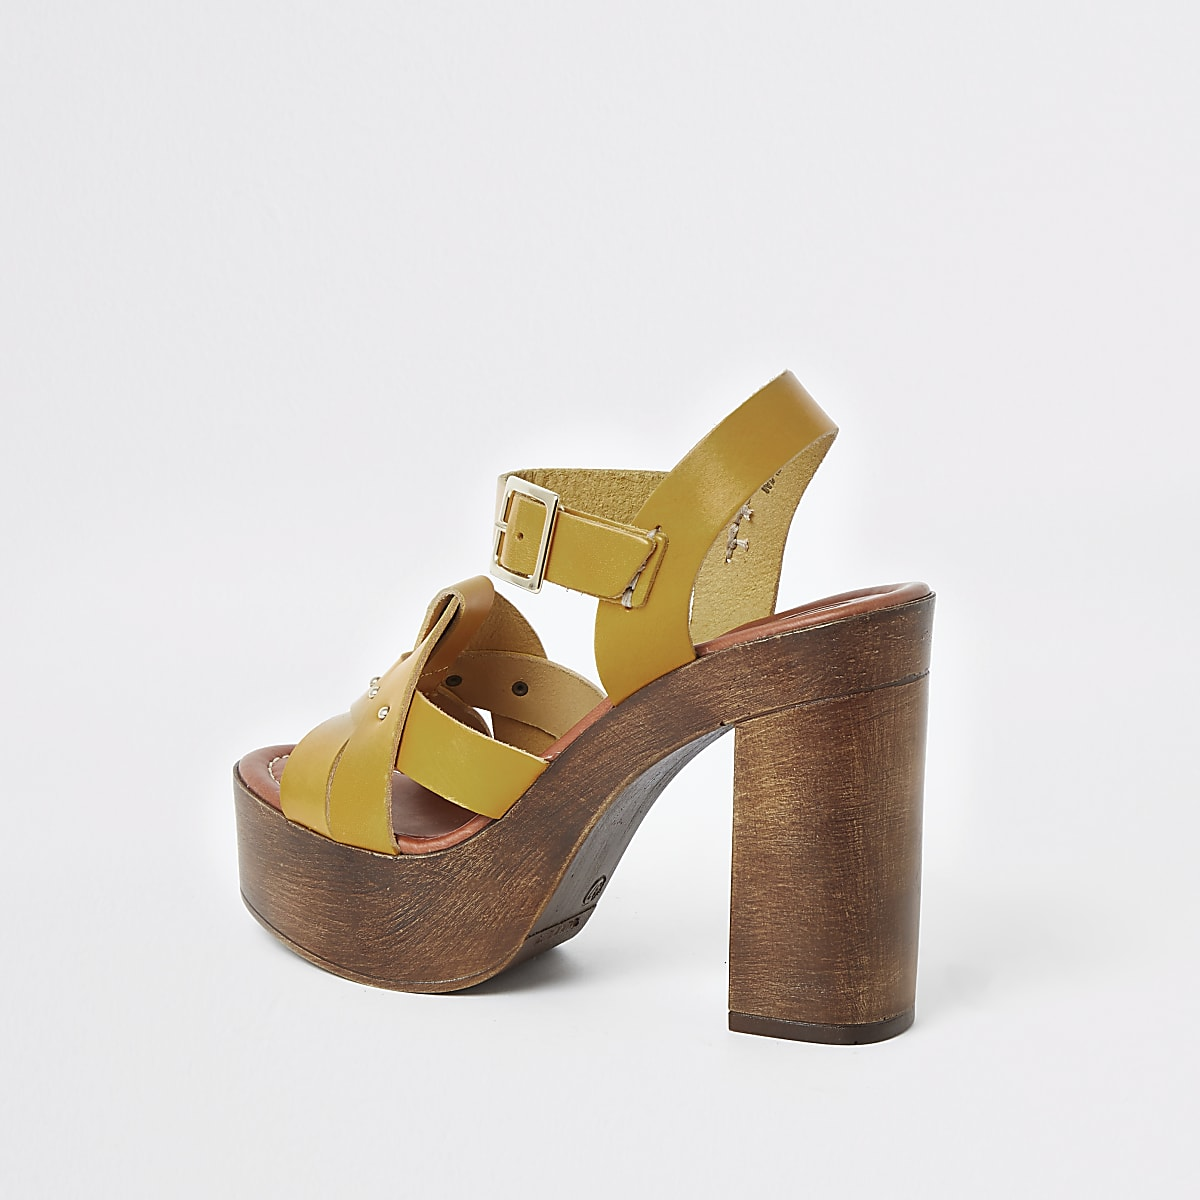 8687594909d2d Yellow leather studded platform heels